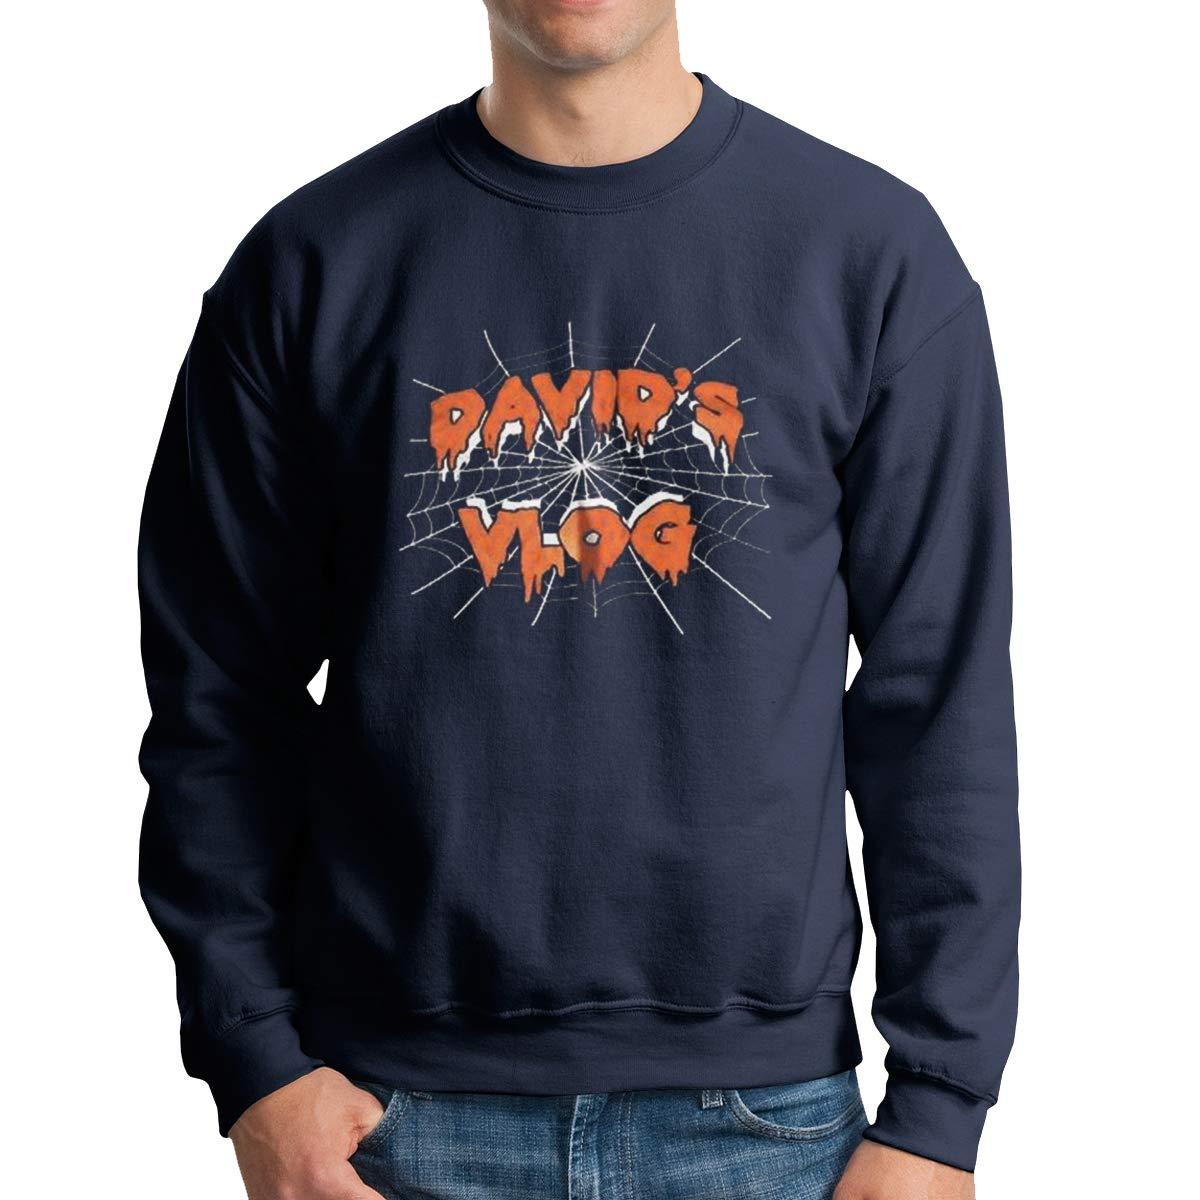 JJHH Shop Fanjoy Tops David Dobrik Mens Boys Crewneck Basketball Team Unisex Pullover Sweatshirt Crew Neck Hoodie